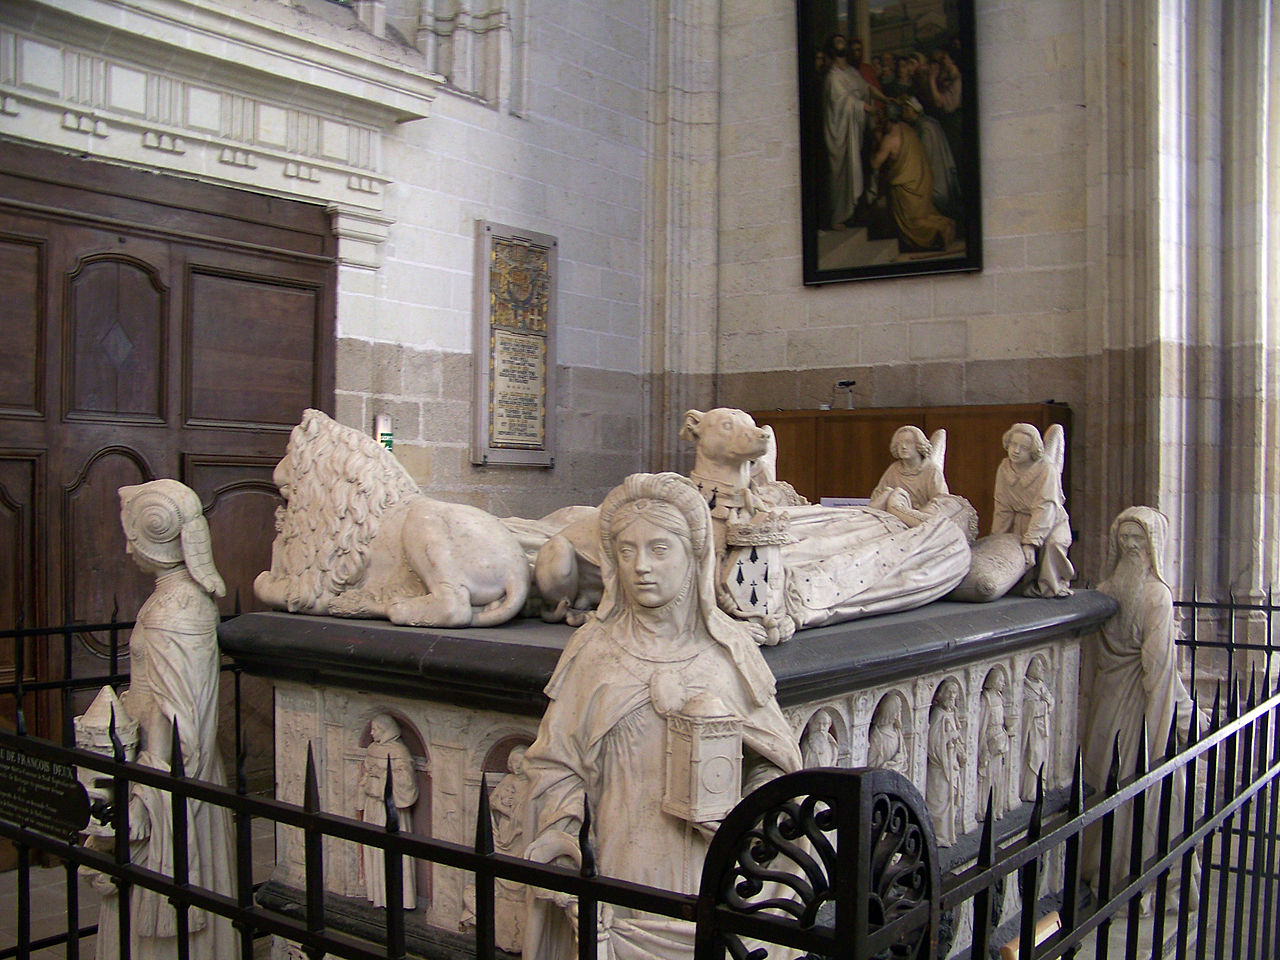 1280px-Nantes_-_cathedrale_-_tombeau_de_Francois_II_ter